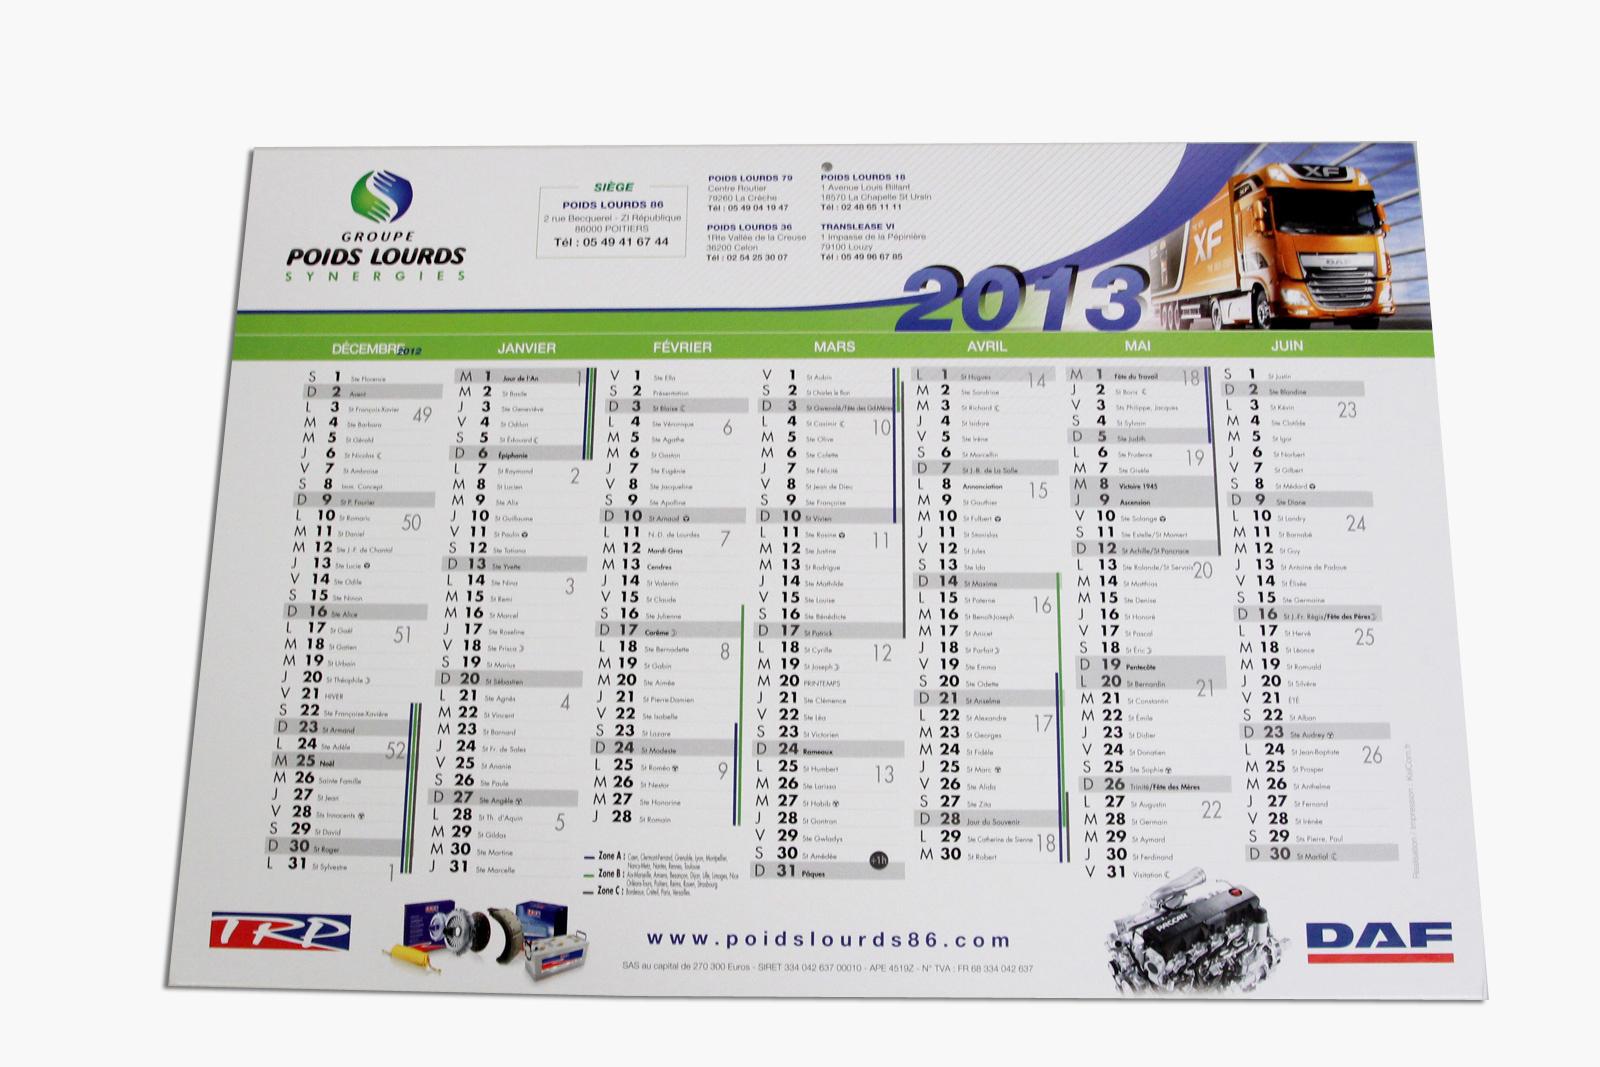 Calendrier Bancaire Personnalise.Impression Calendrier Bancaire 210x297 Format Bancaire